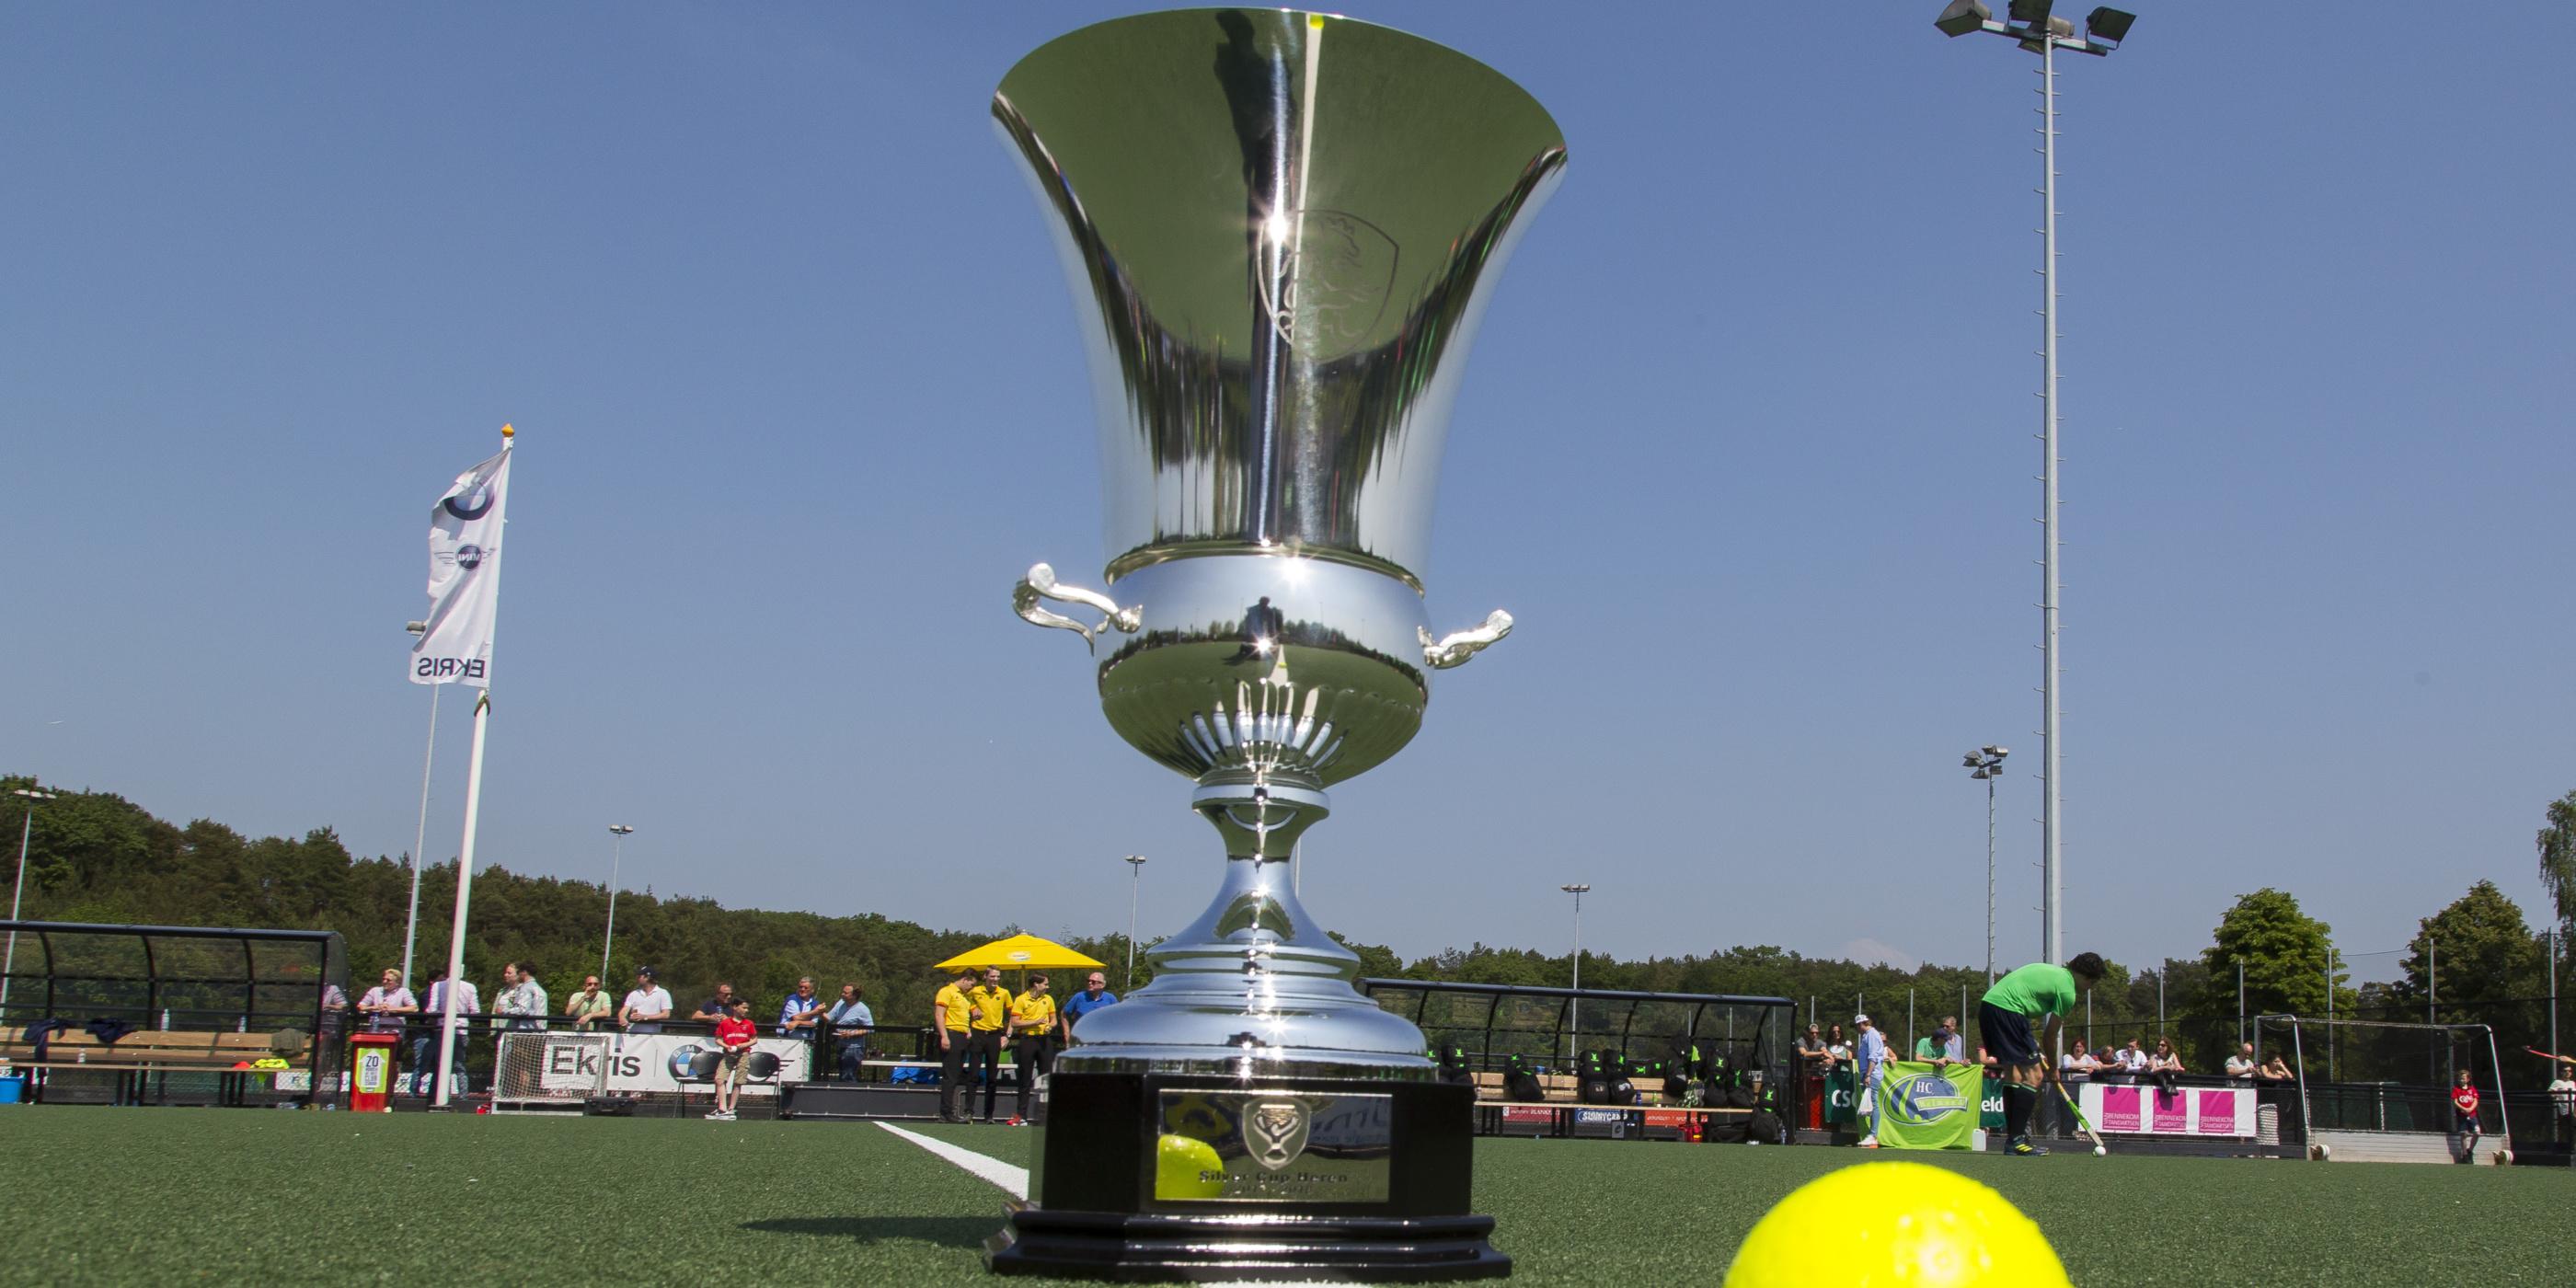 Loting Silver Cup Heren ronde 3 en Gold Cup Dames ronde 4 (kwartfinales)